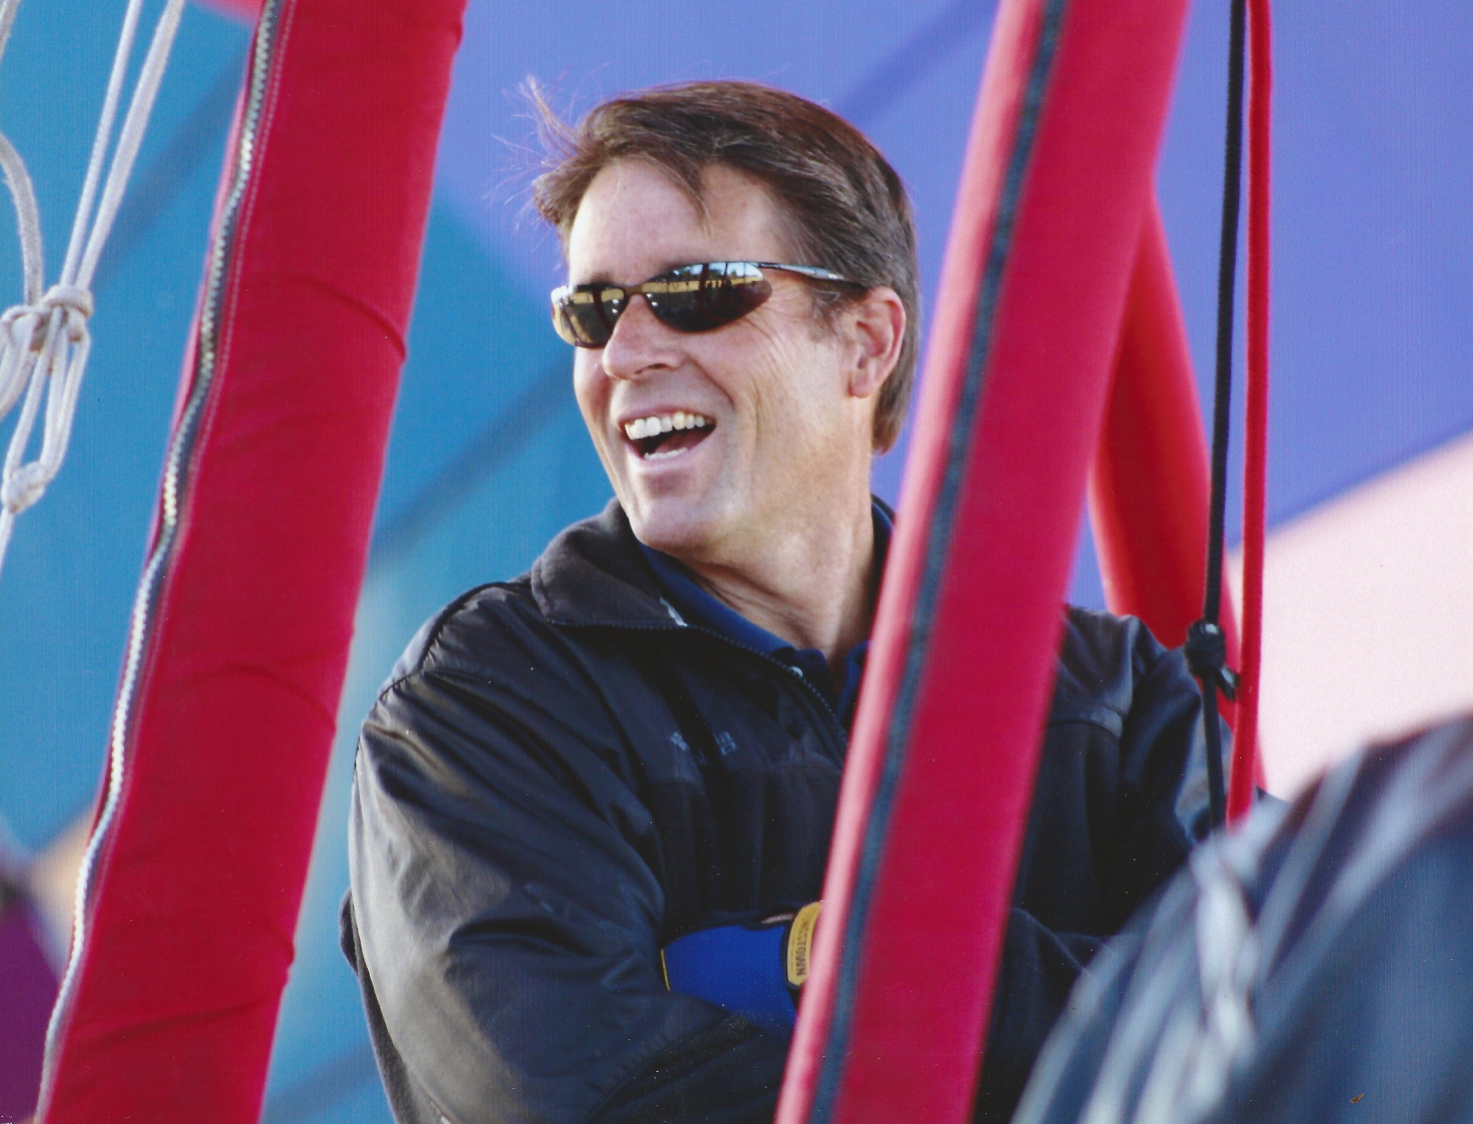 Pilot Kevin Flanagan getting ready for a hot air balloon ride.